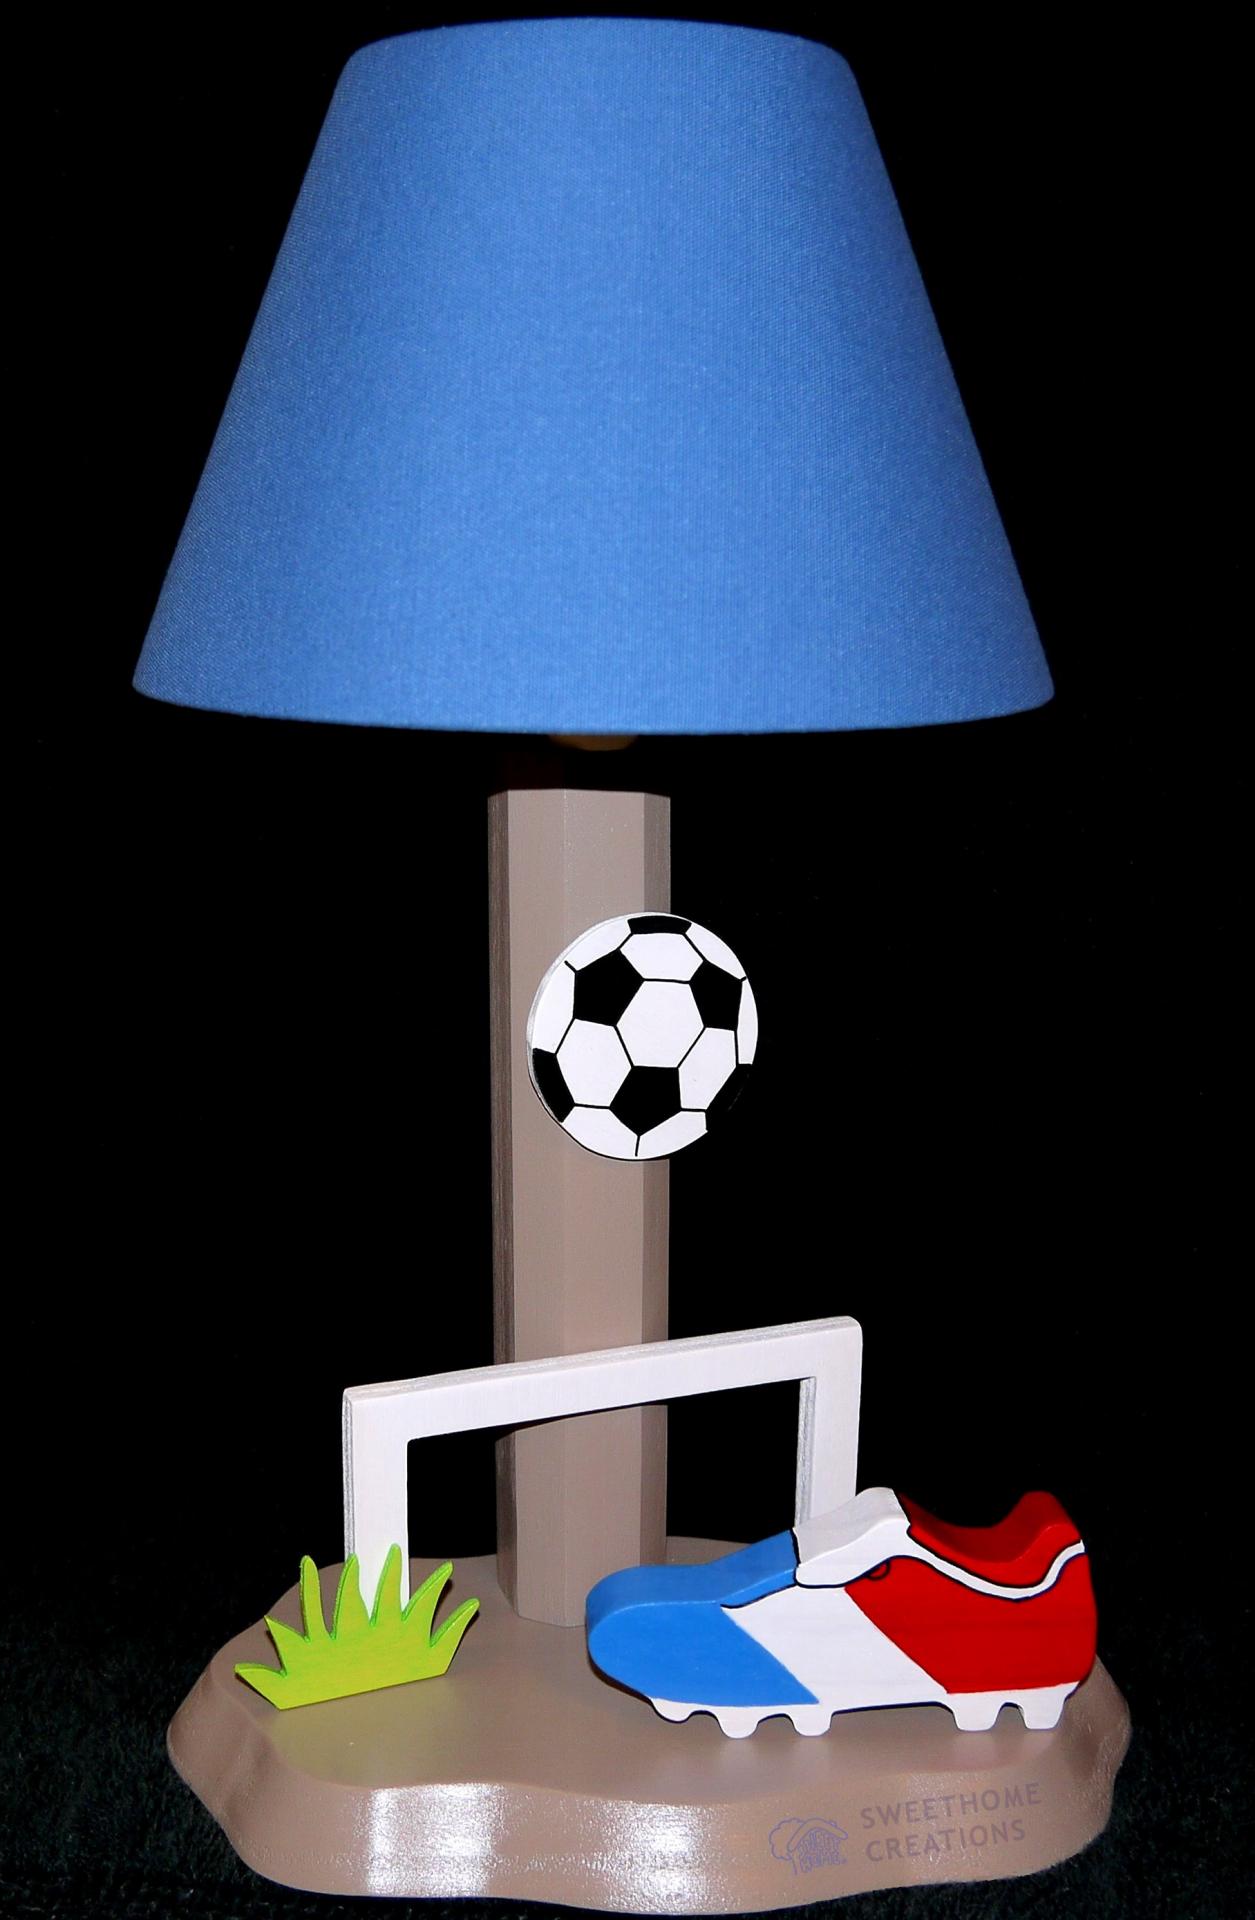 Lampe foot - Lampe de chevet foot ...